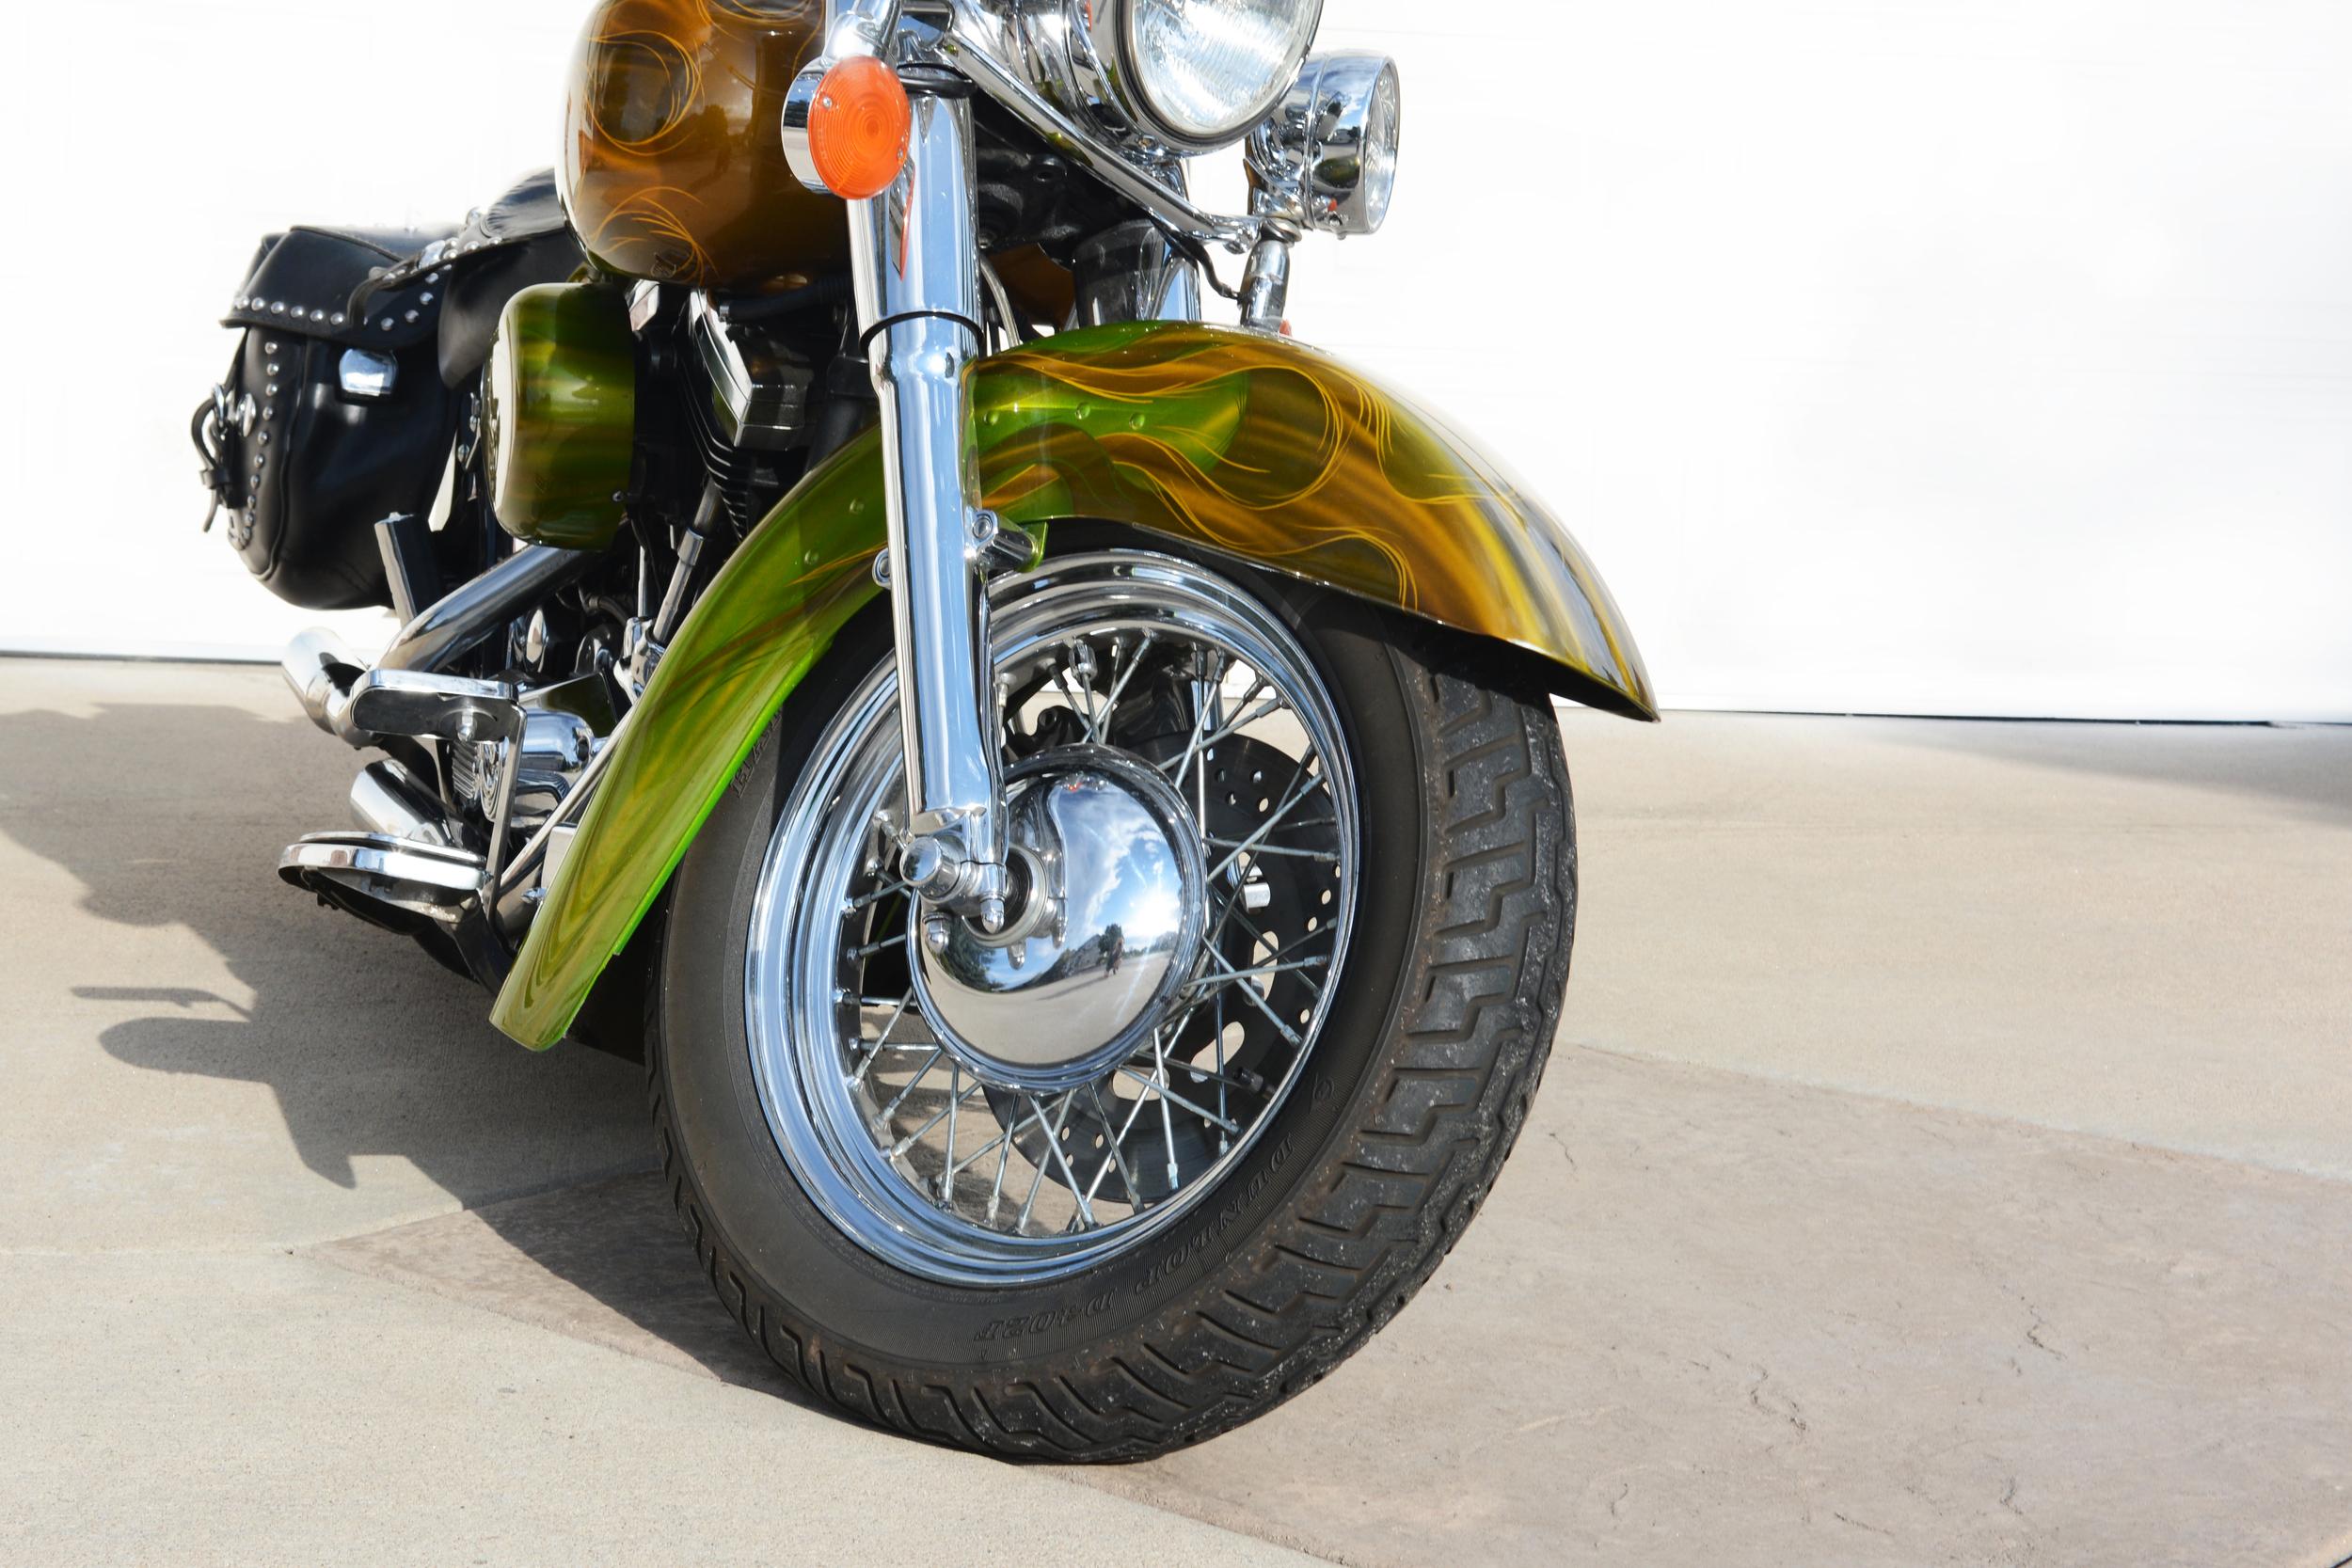 1993 Harley Davidson Heritage Softail